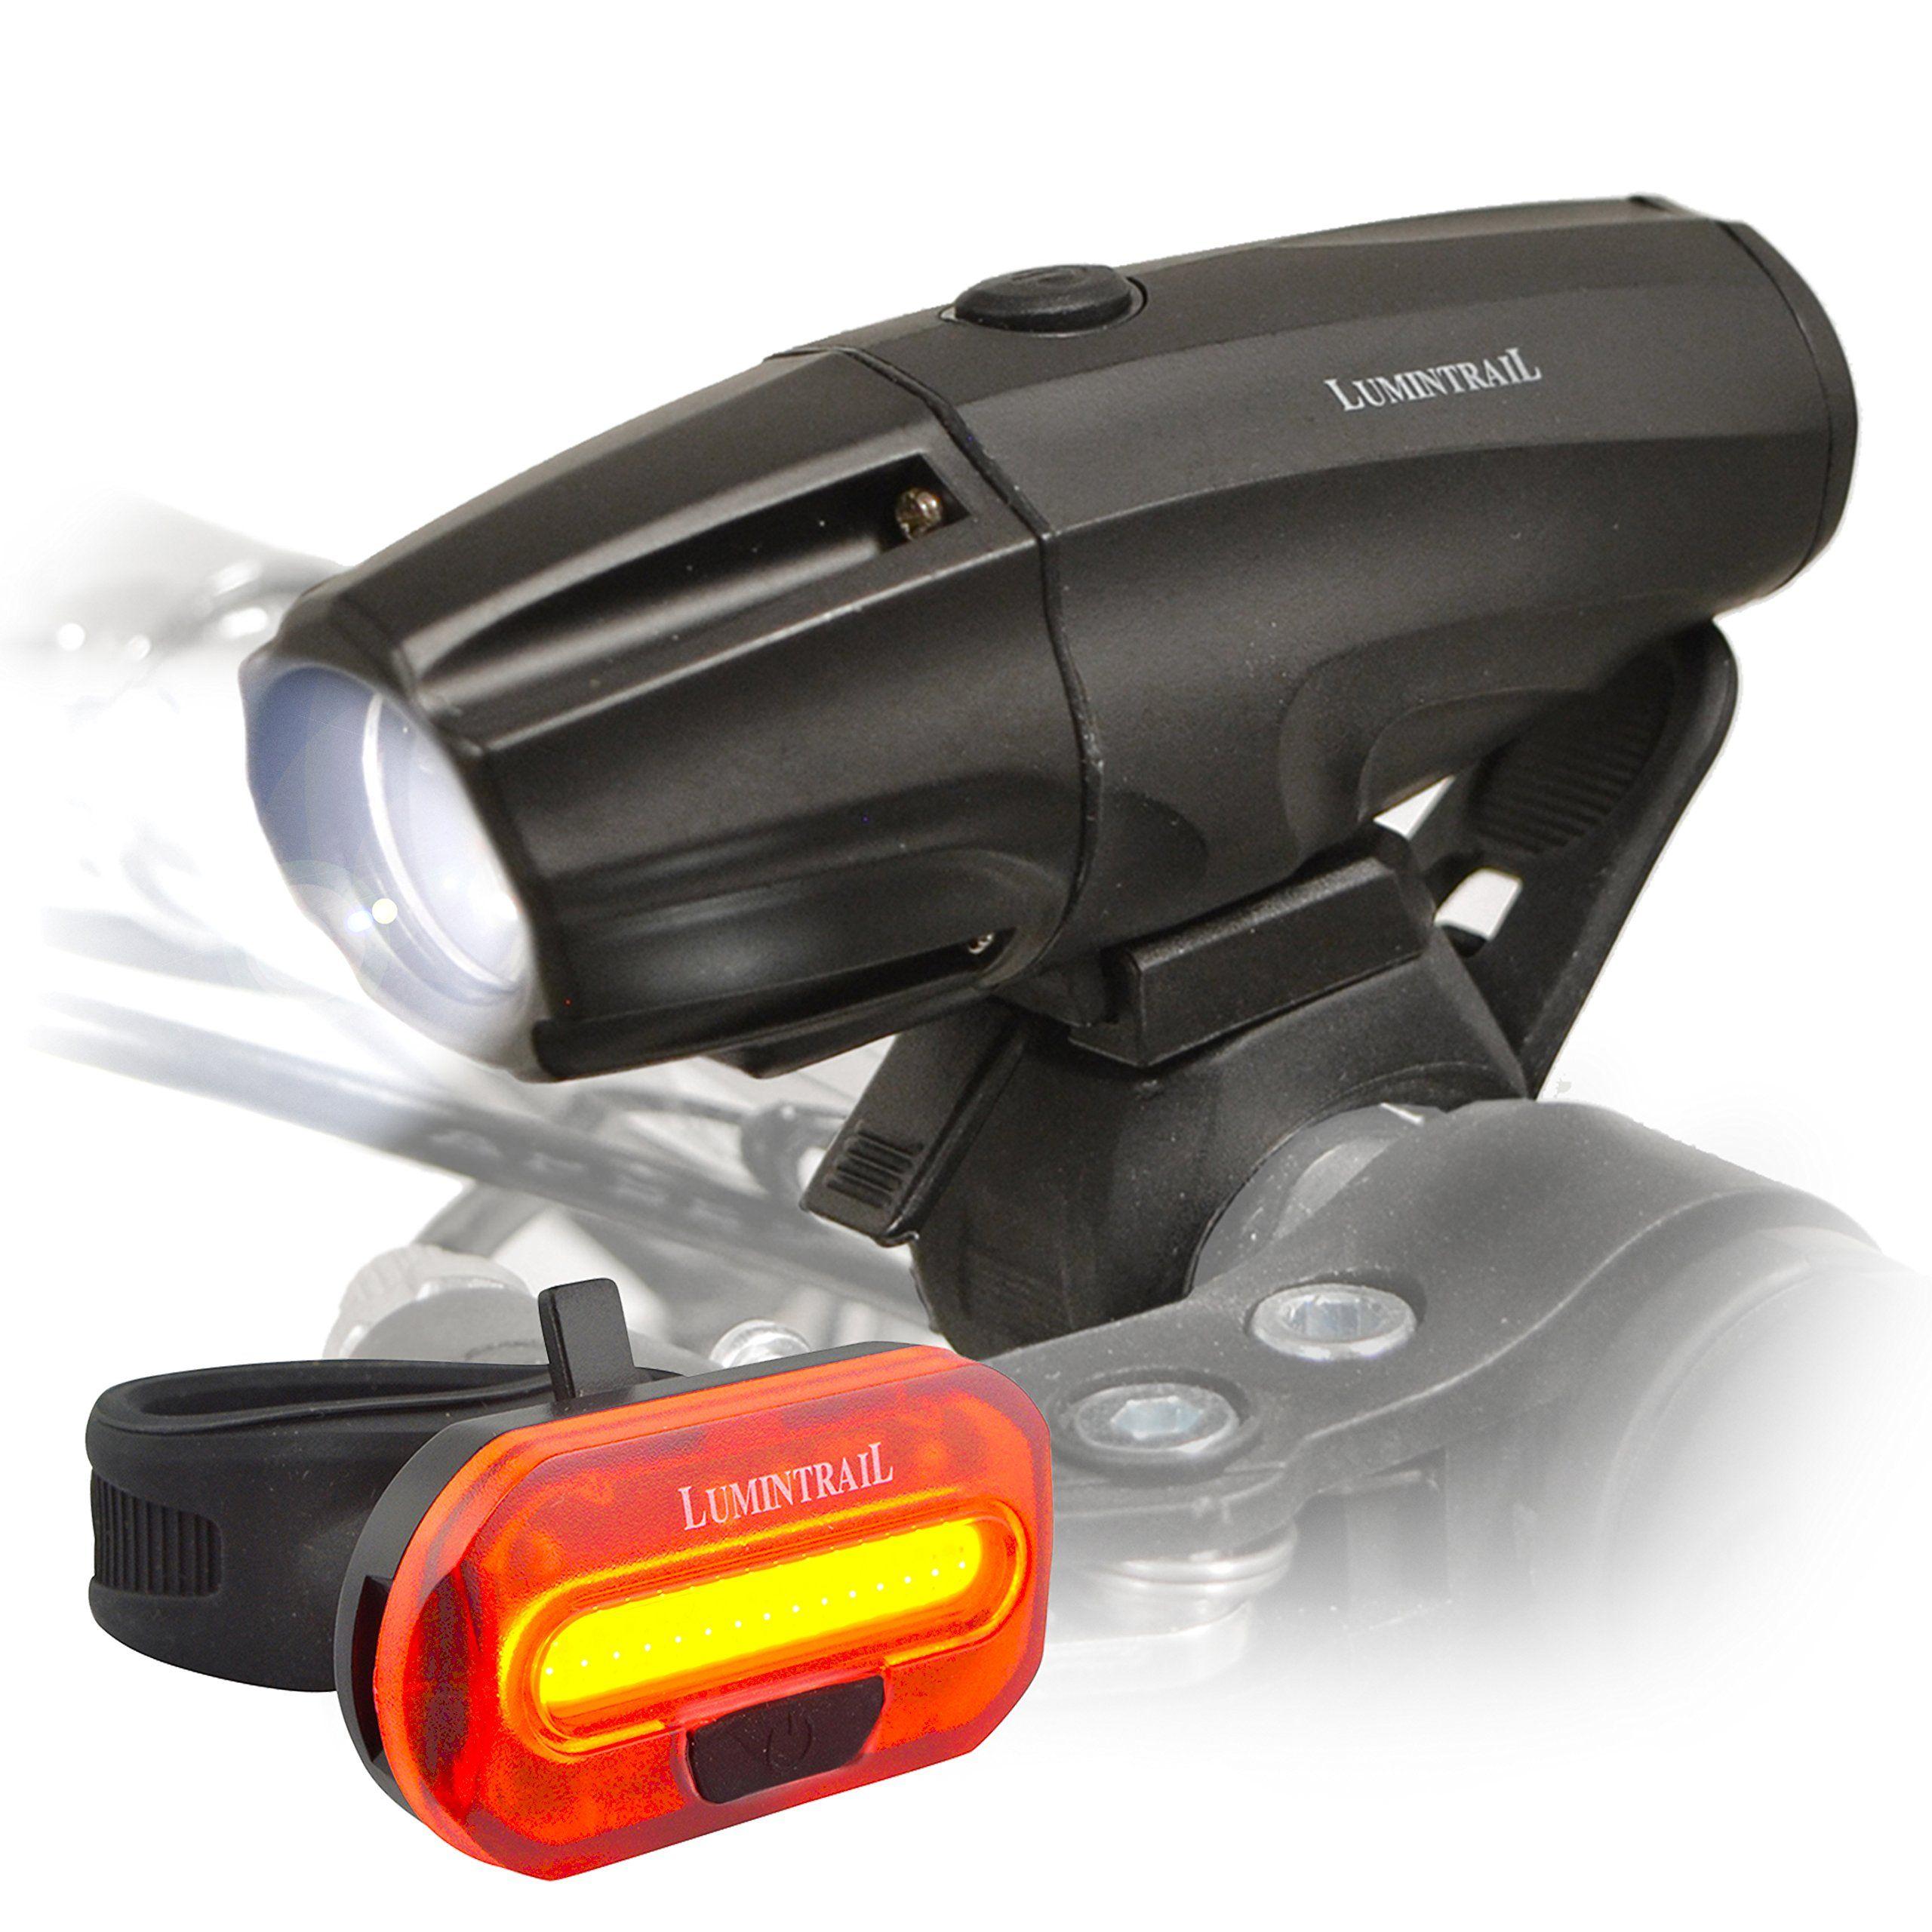 Lumintrail Super Bright Usb Rechargeable Led Bike Light Set